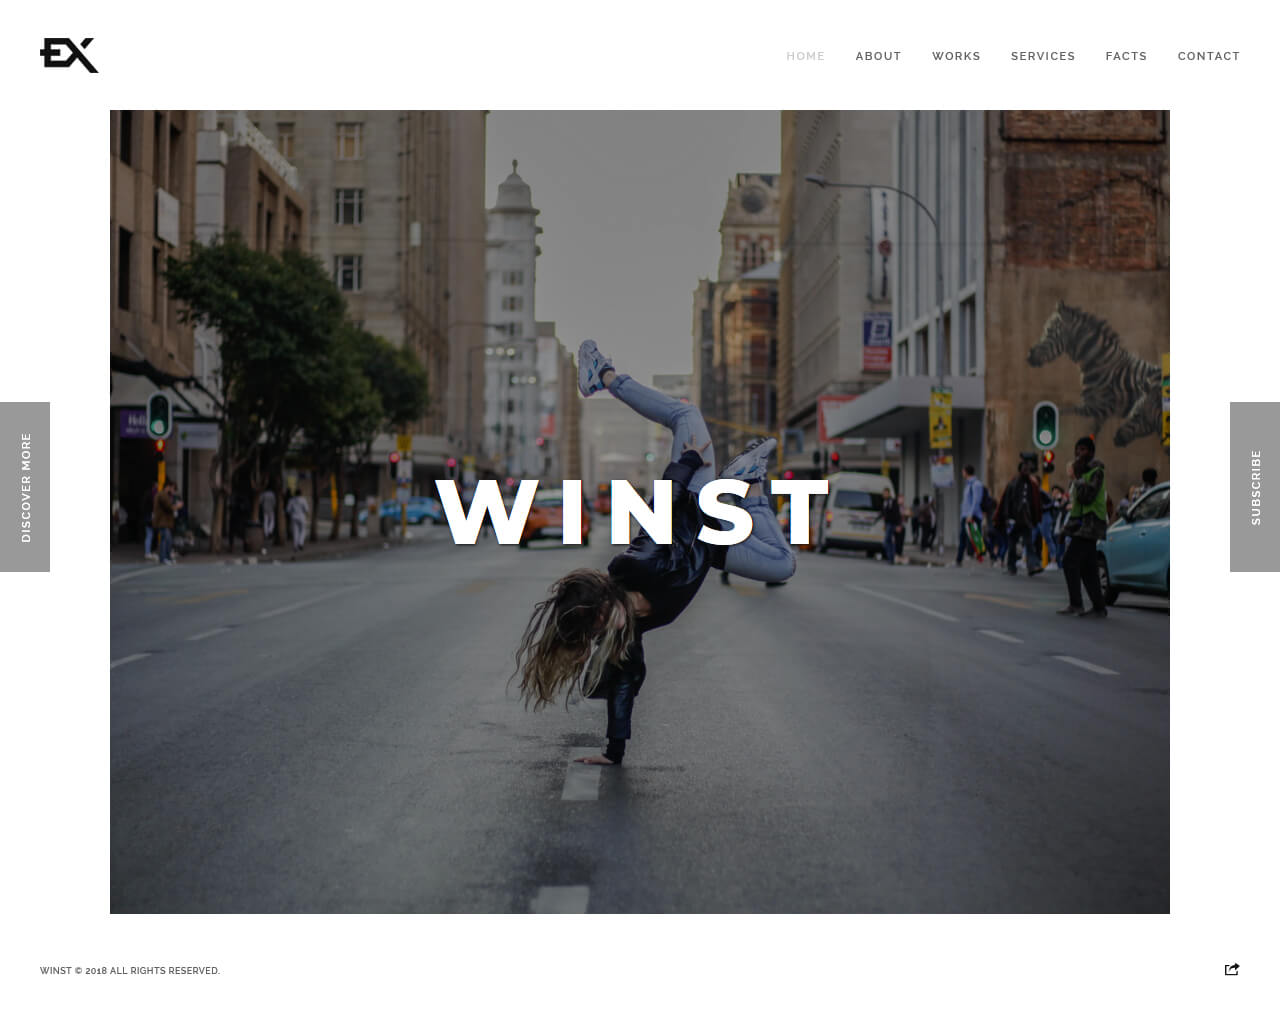 Winst Website Template